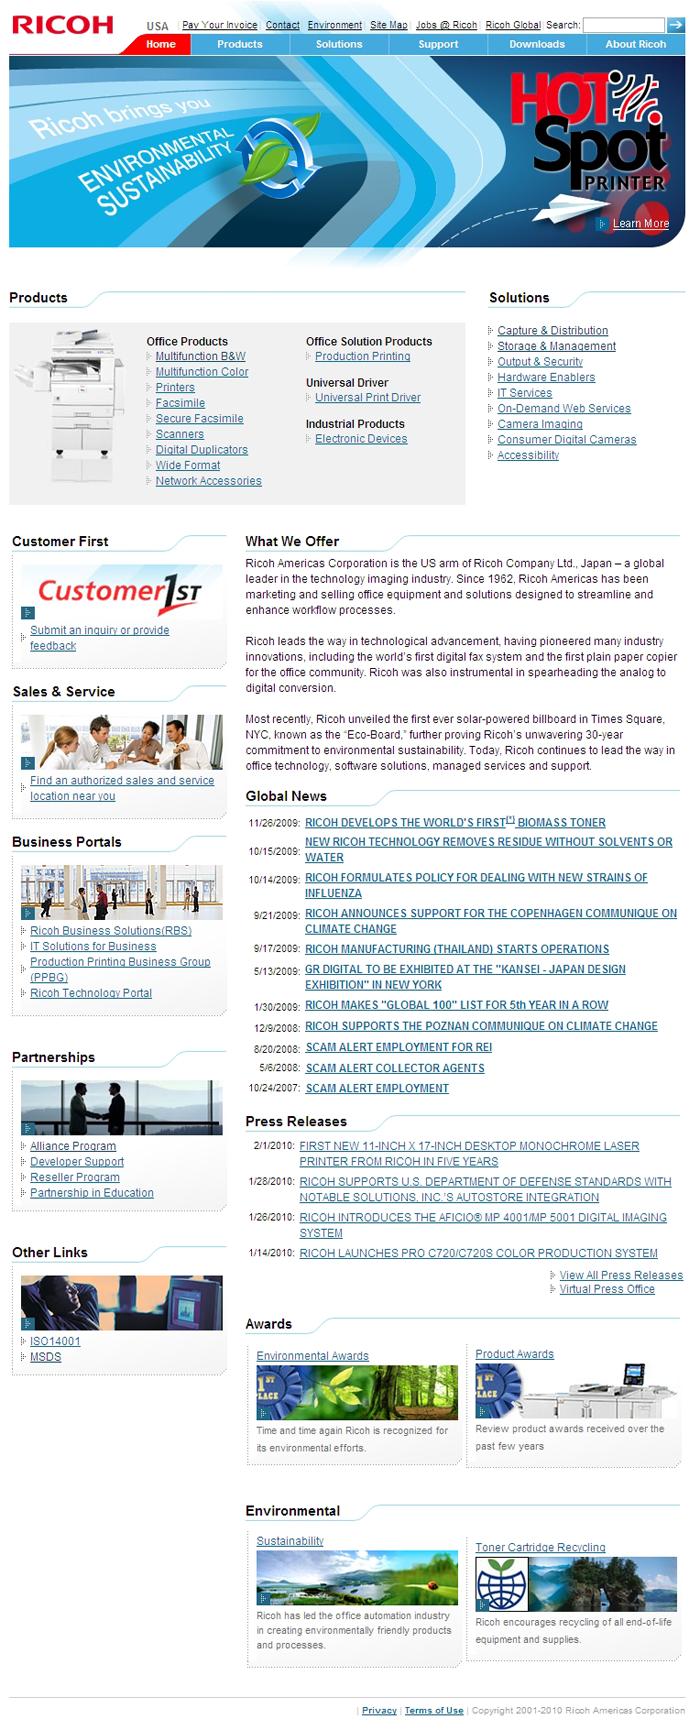 Ricoh USA Corporate Website 2008-2010